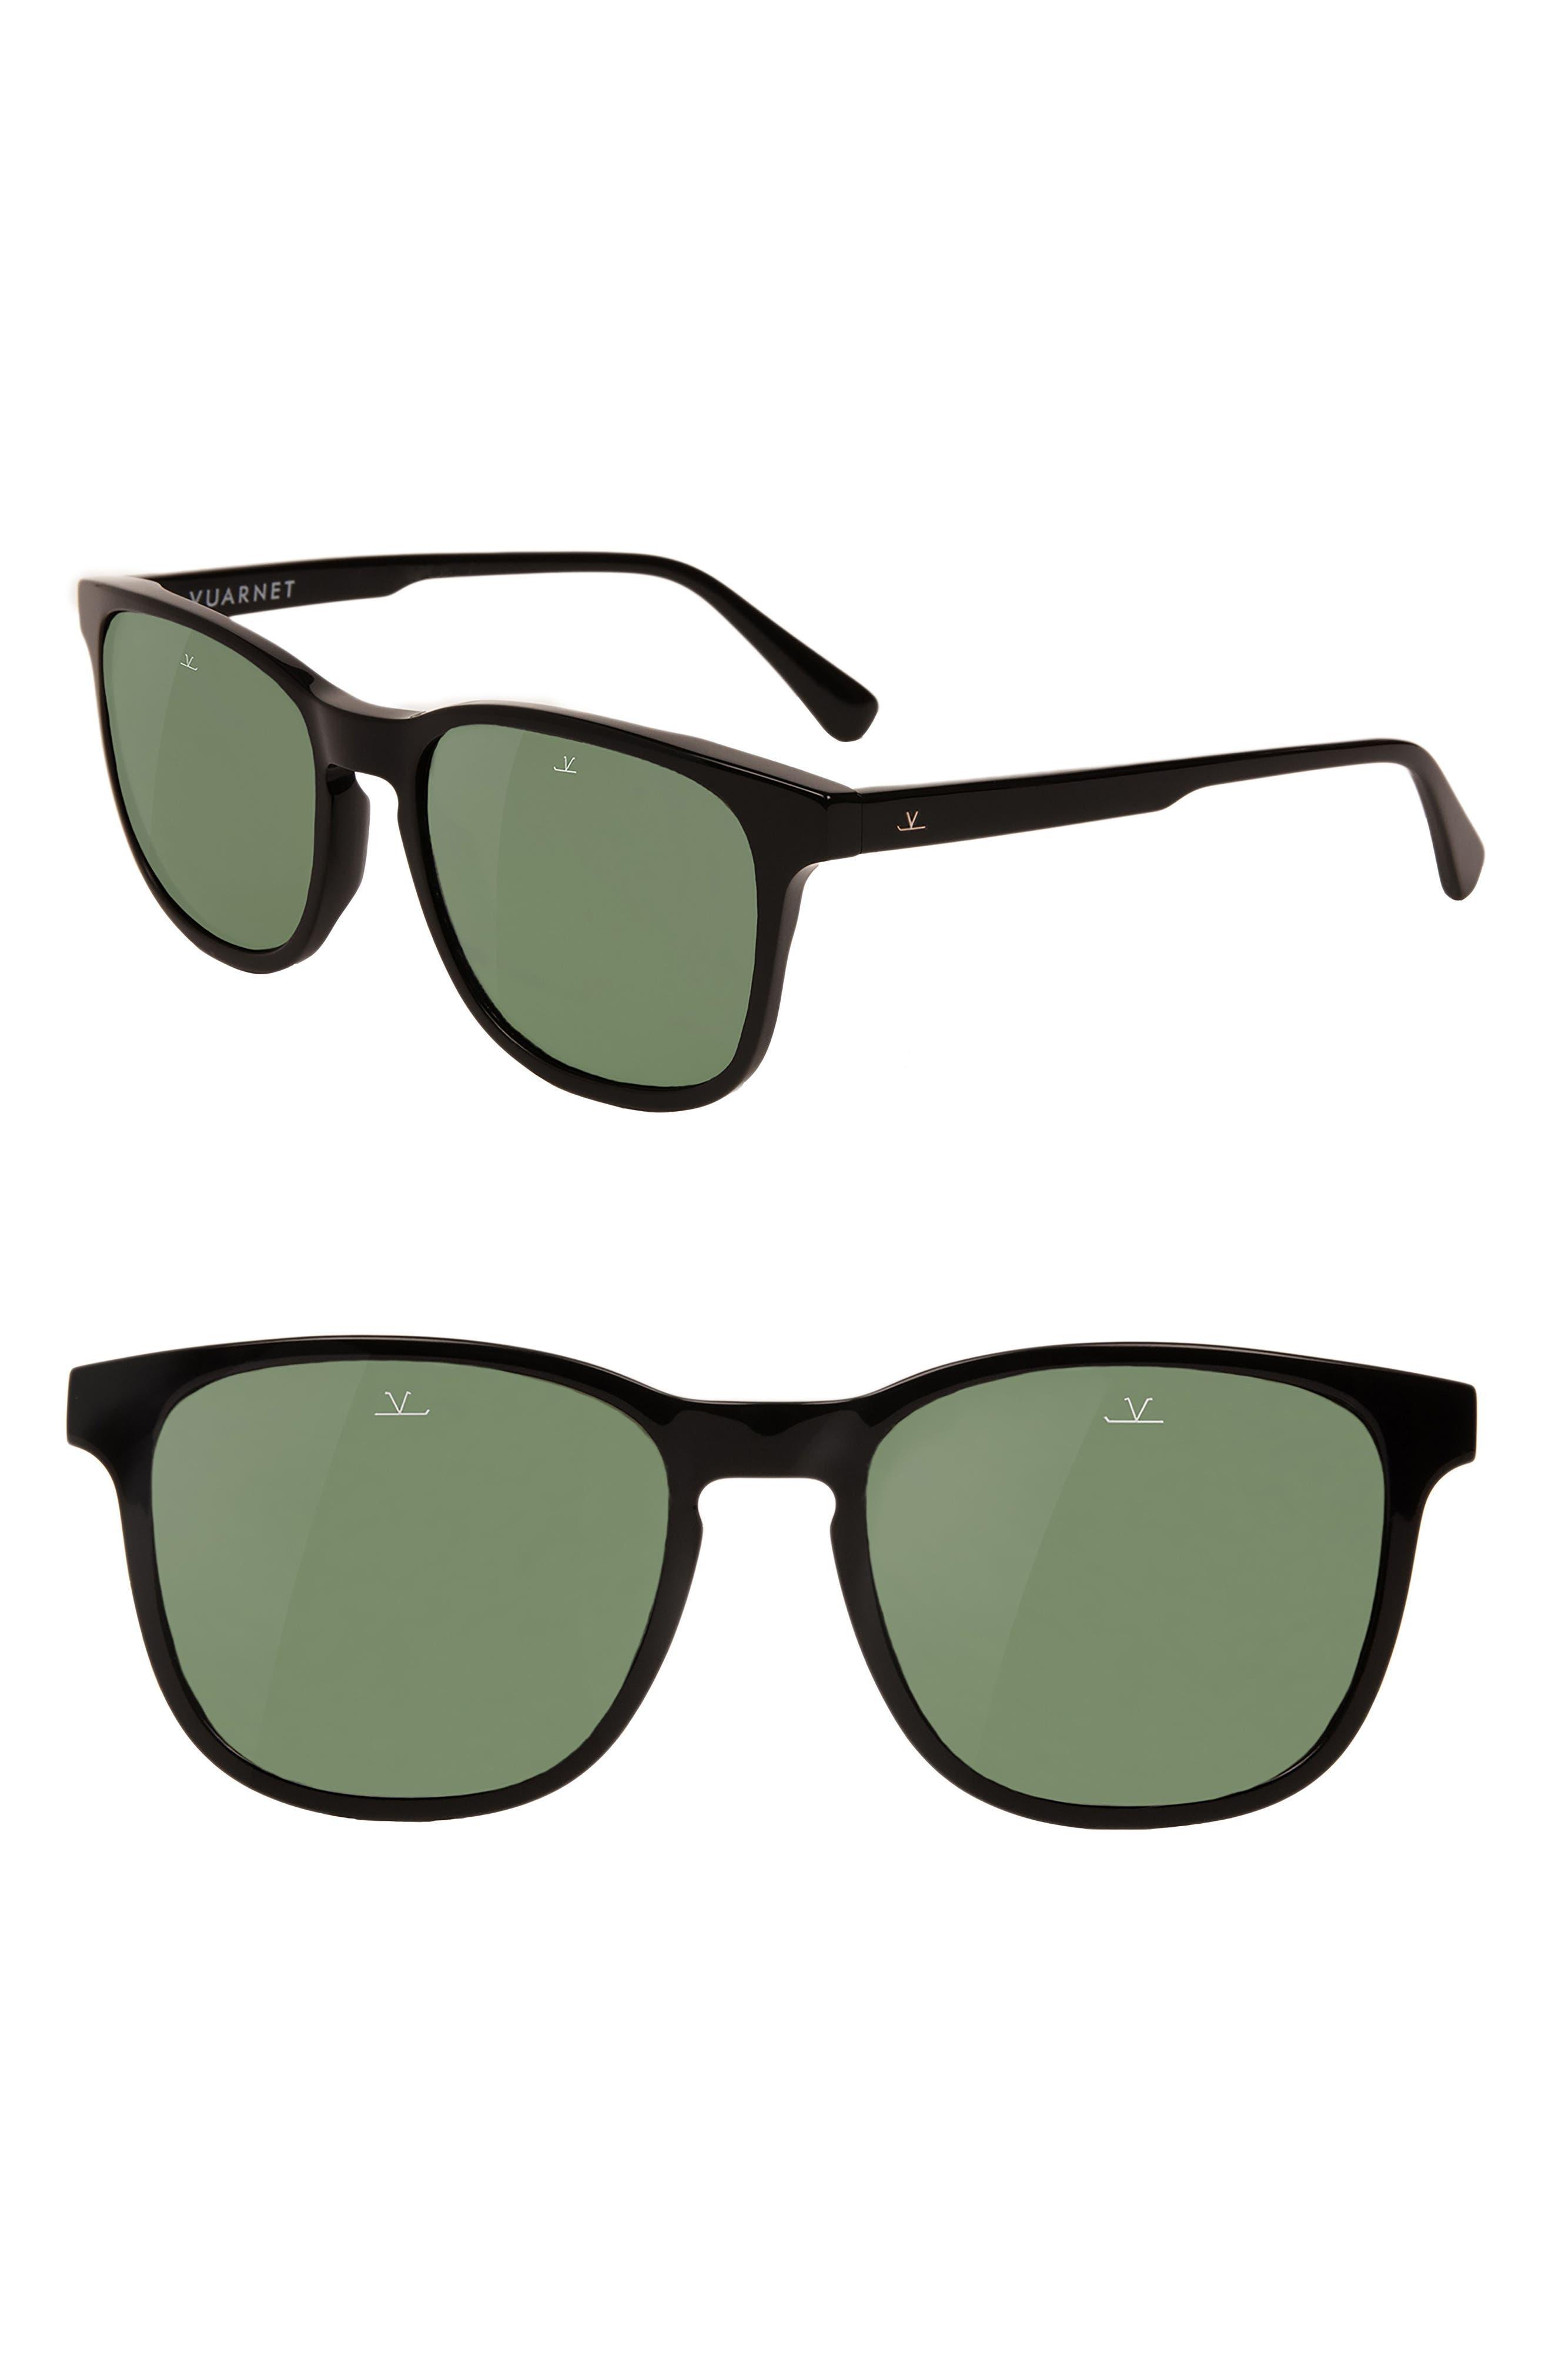 Main Image - Vuarnet District Medium 53mm Sunglasses